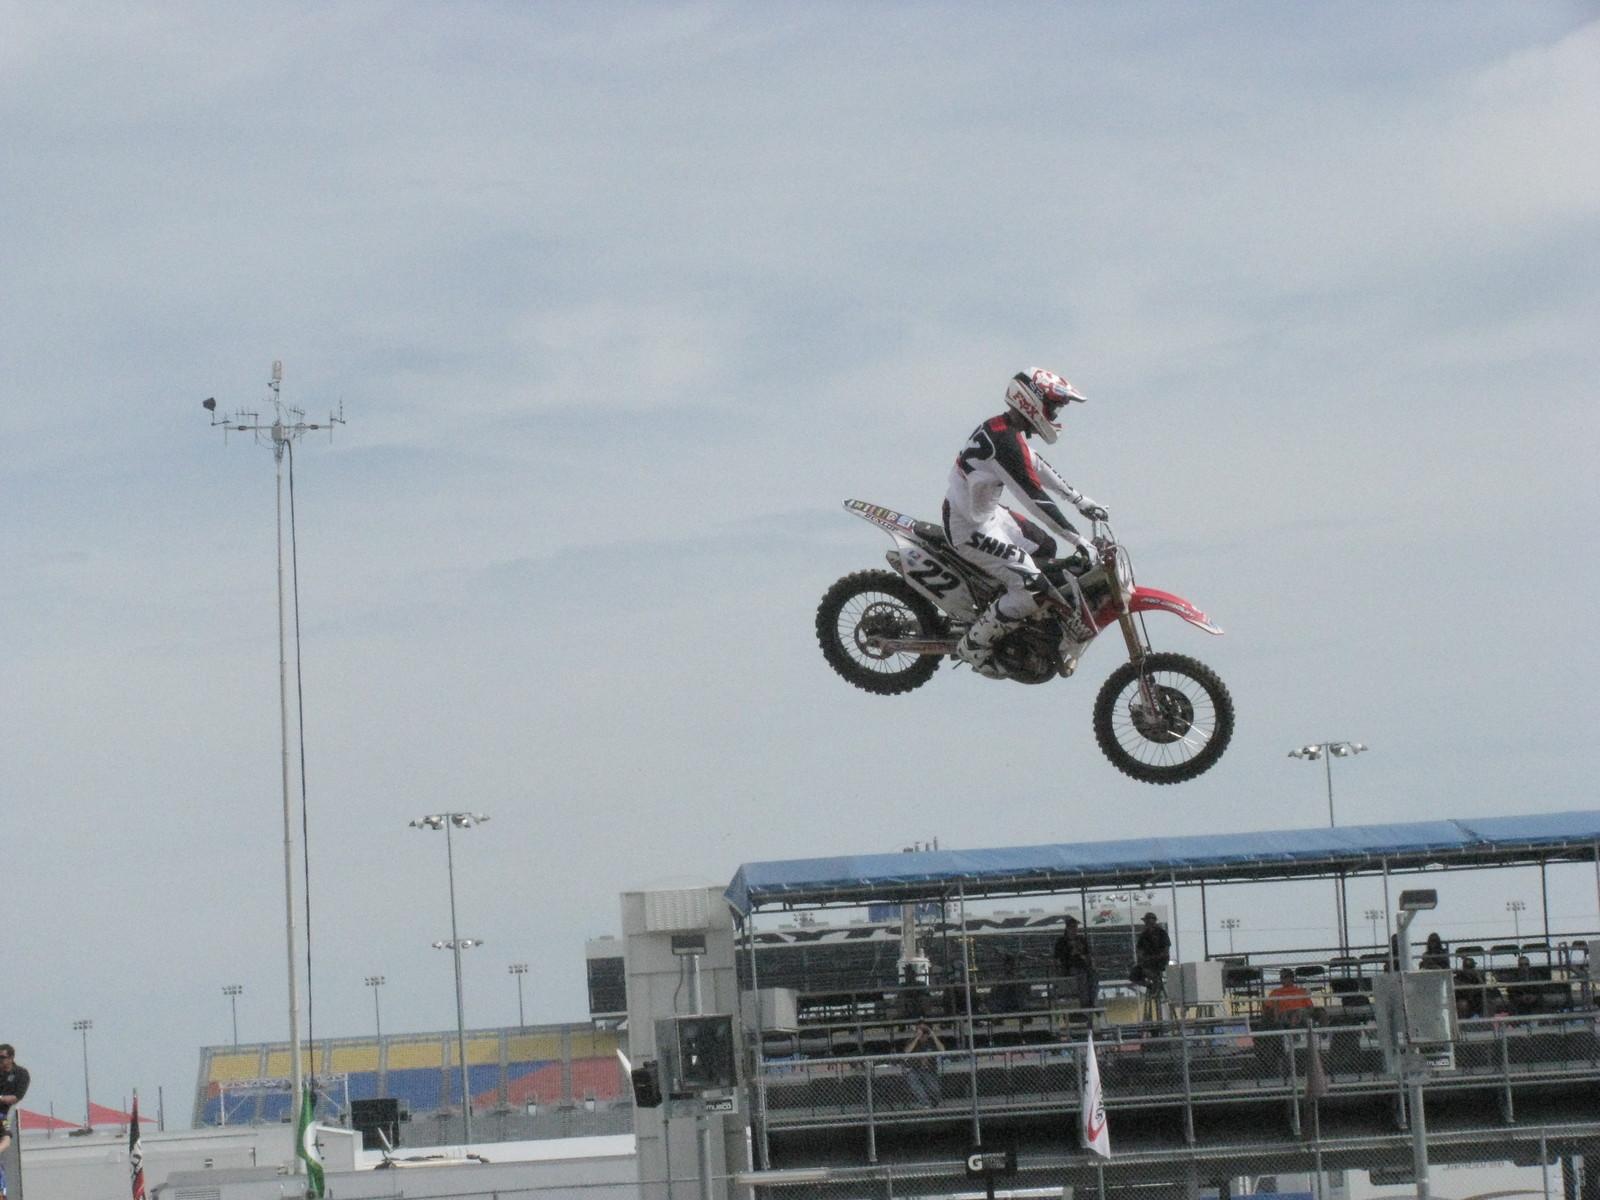 IMG 0534 - MxPro318 - Motocross Pictures - Vital MX